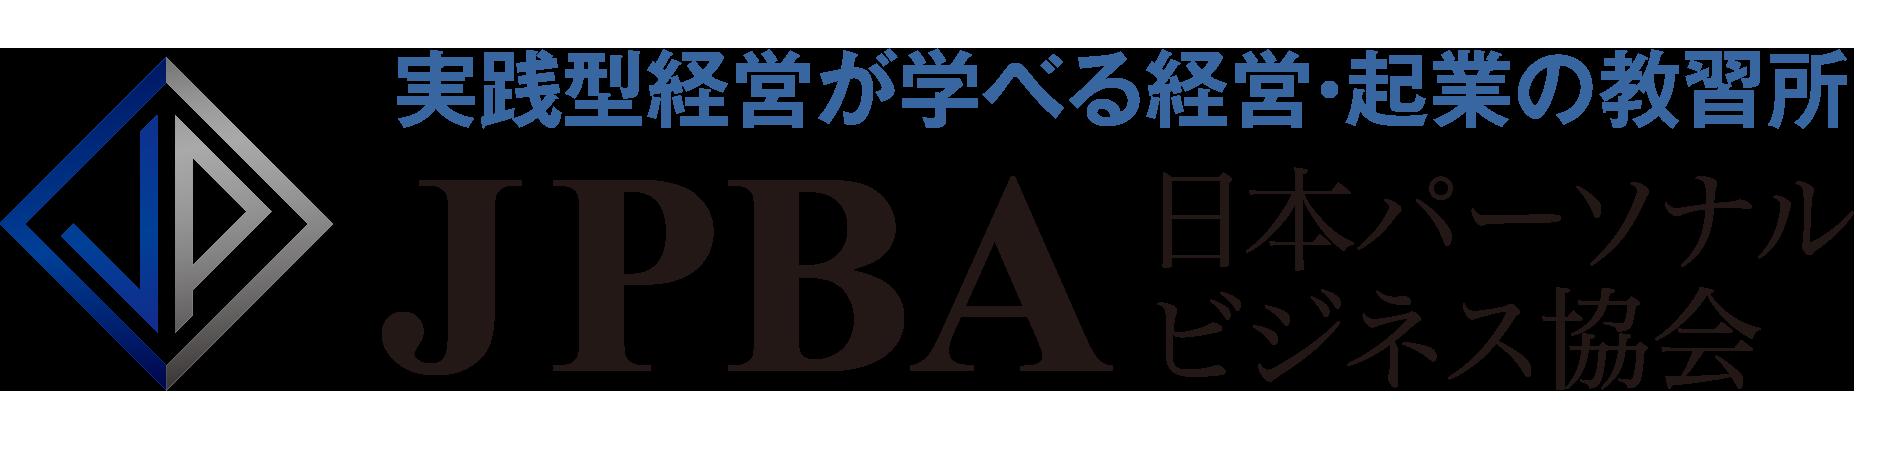 JPBA|一般社団法人日本パーソナルビジネス協会|「経営力教育」で豊かな社会を共に創る